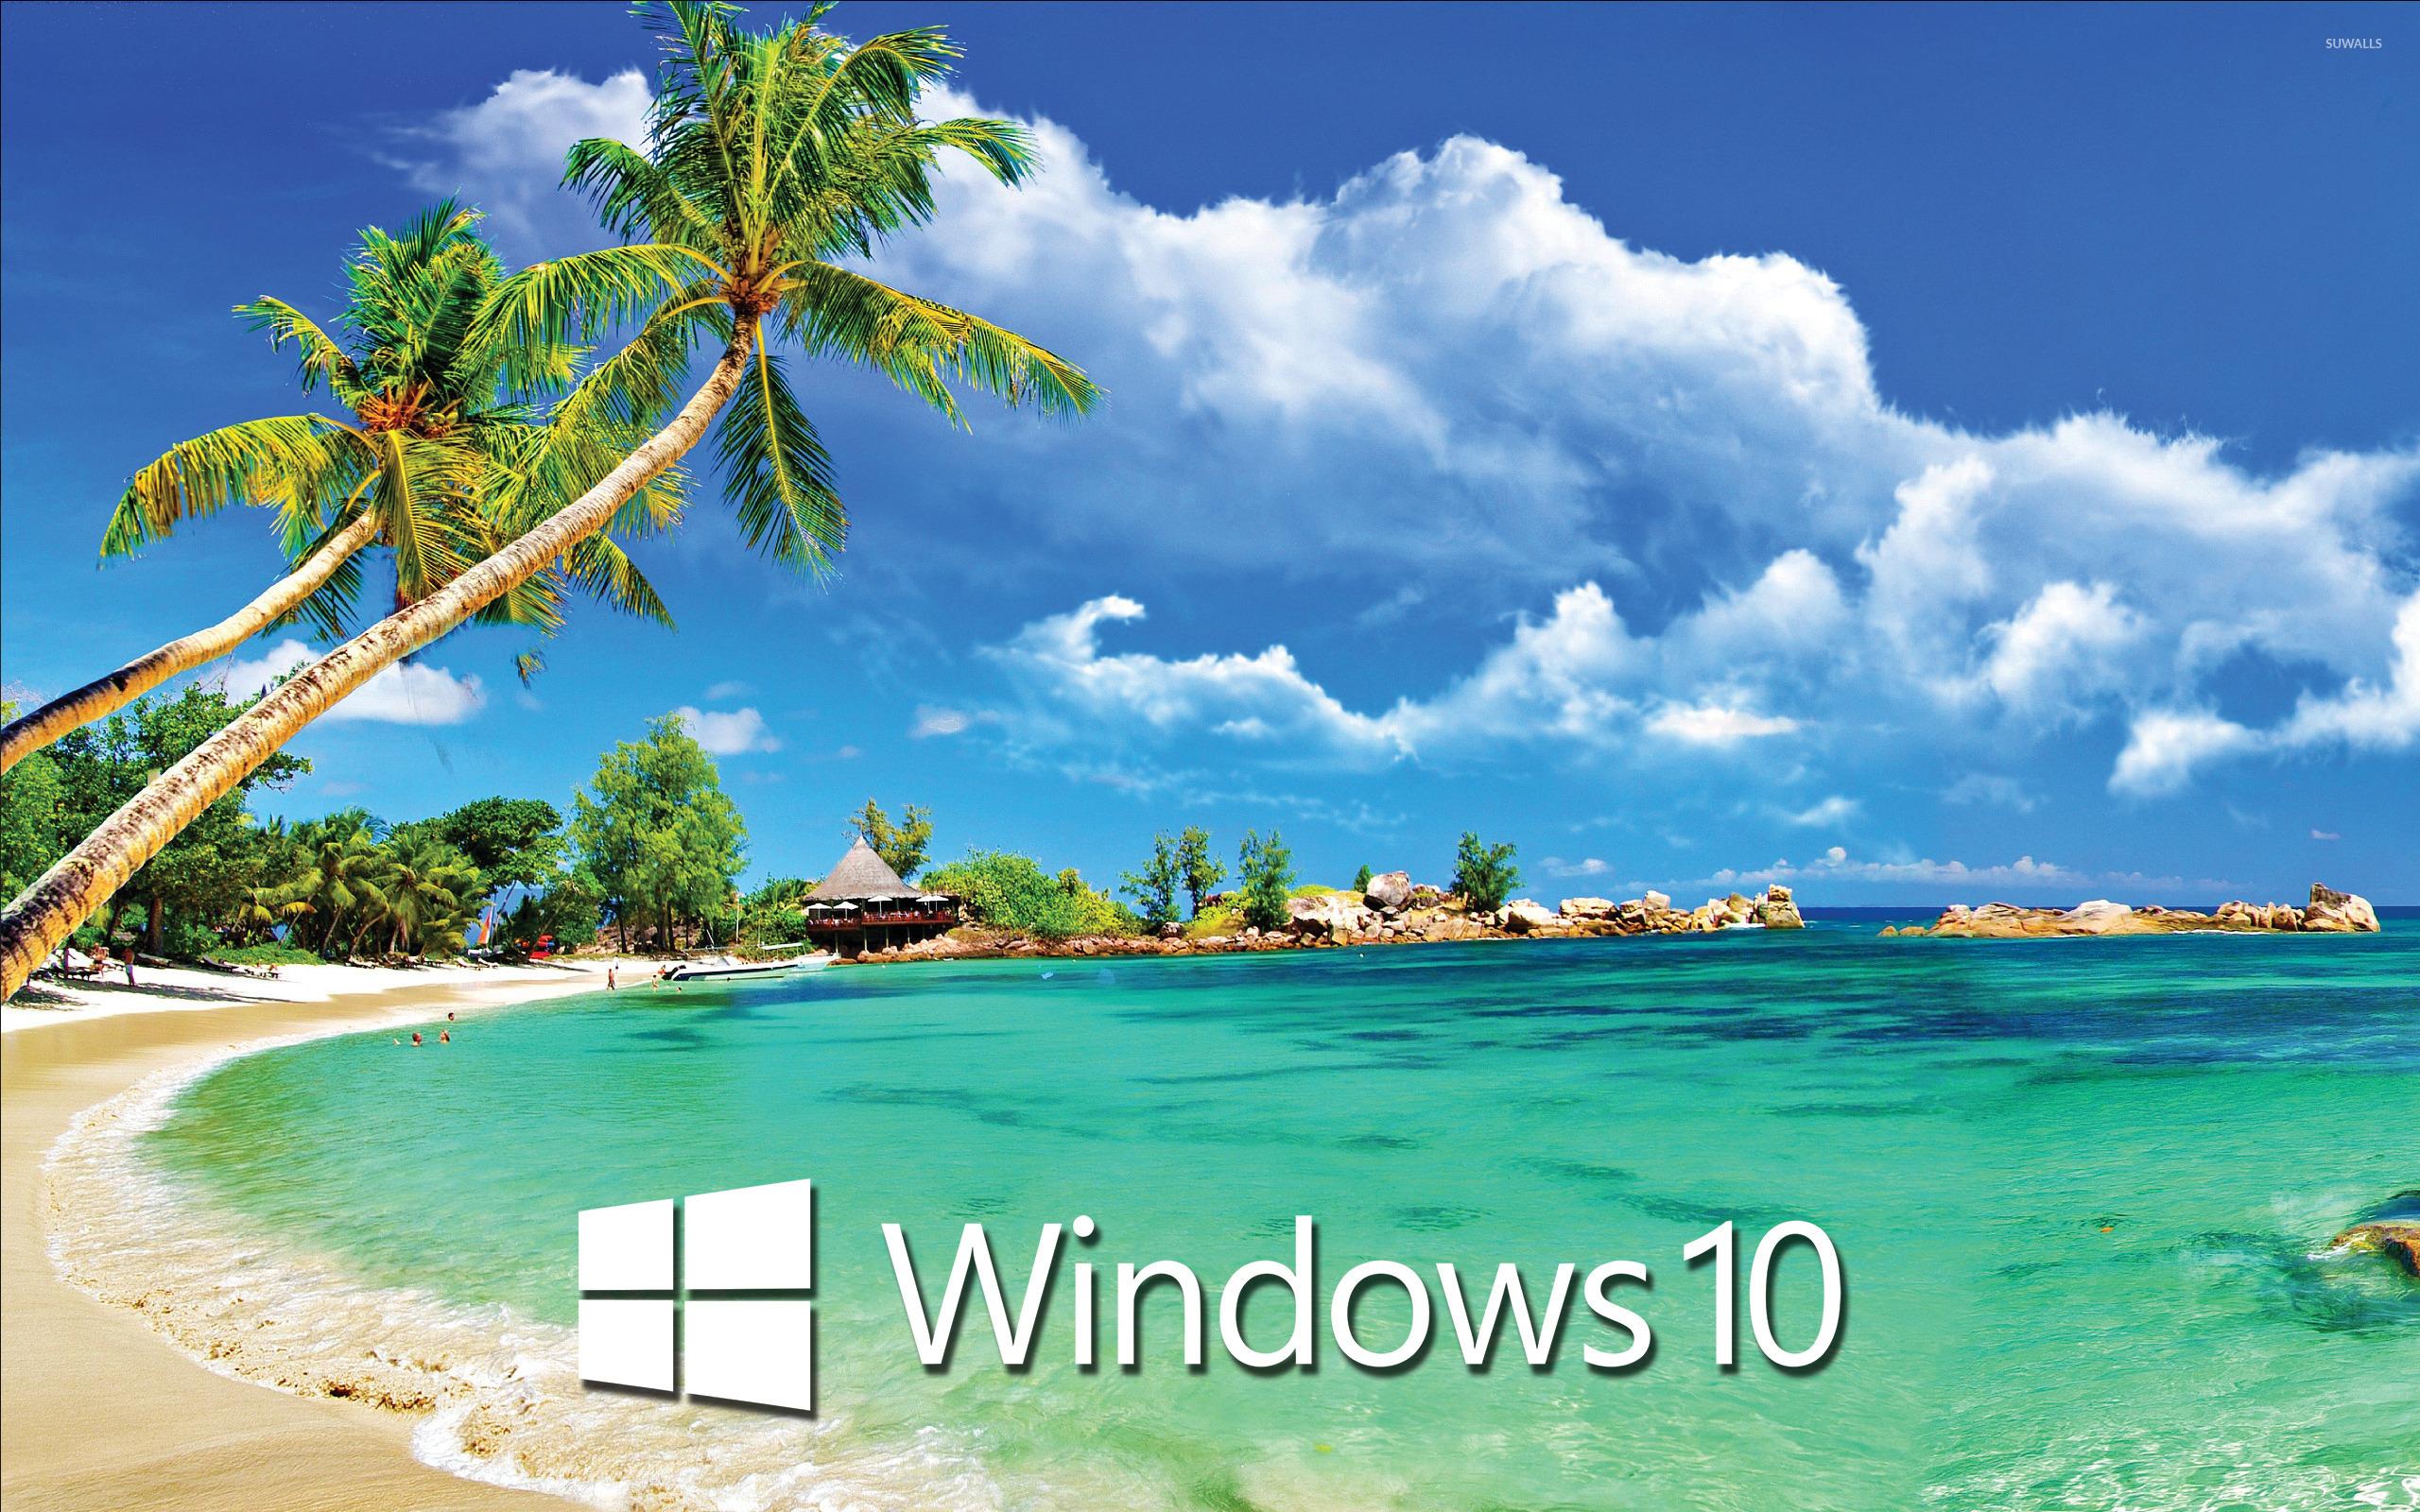 Windows 10 Beach Wallpaper Location